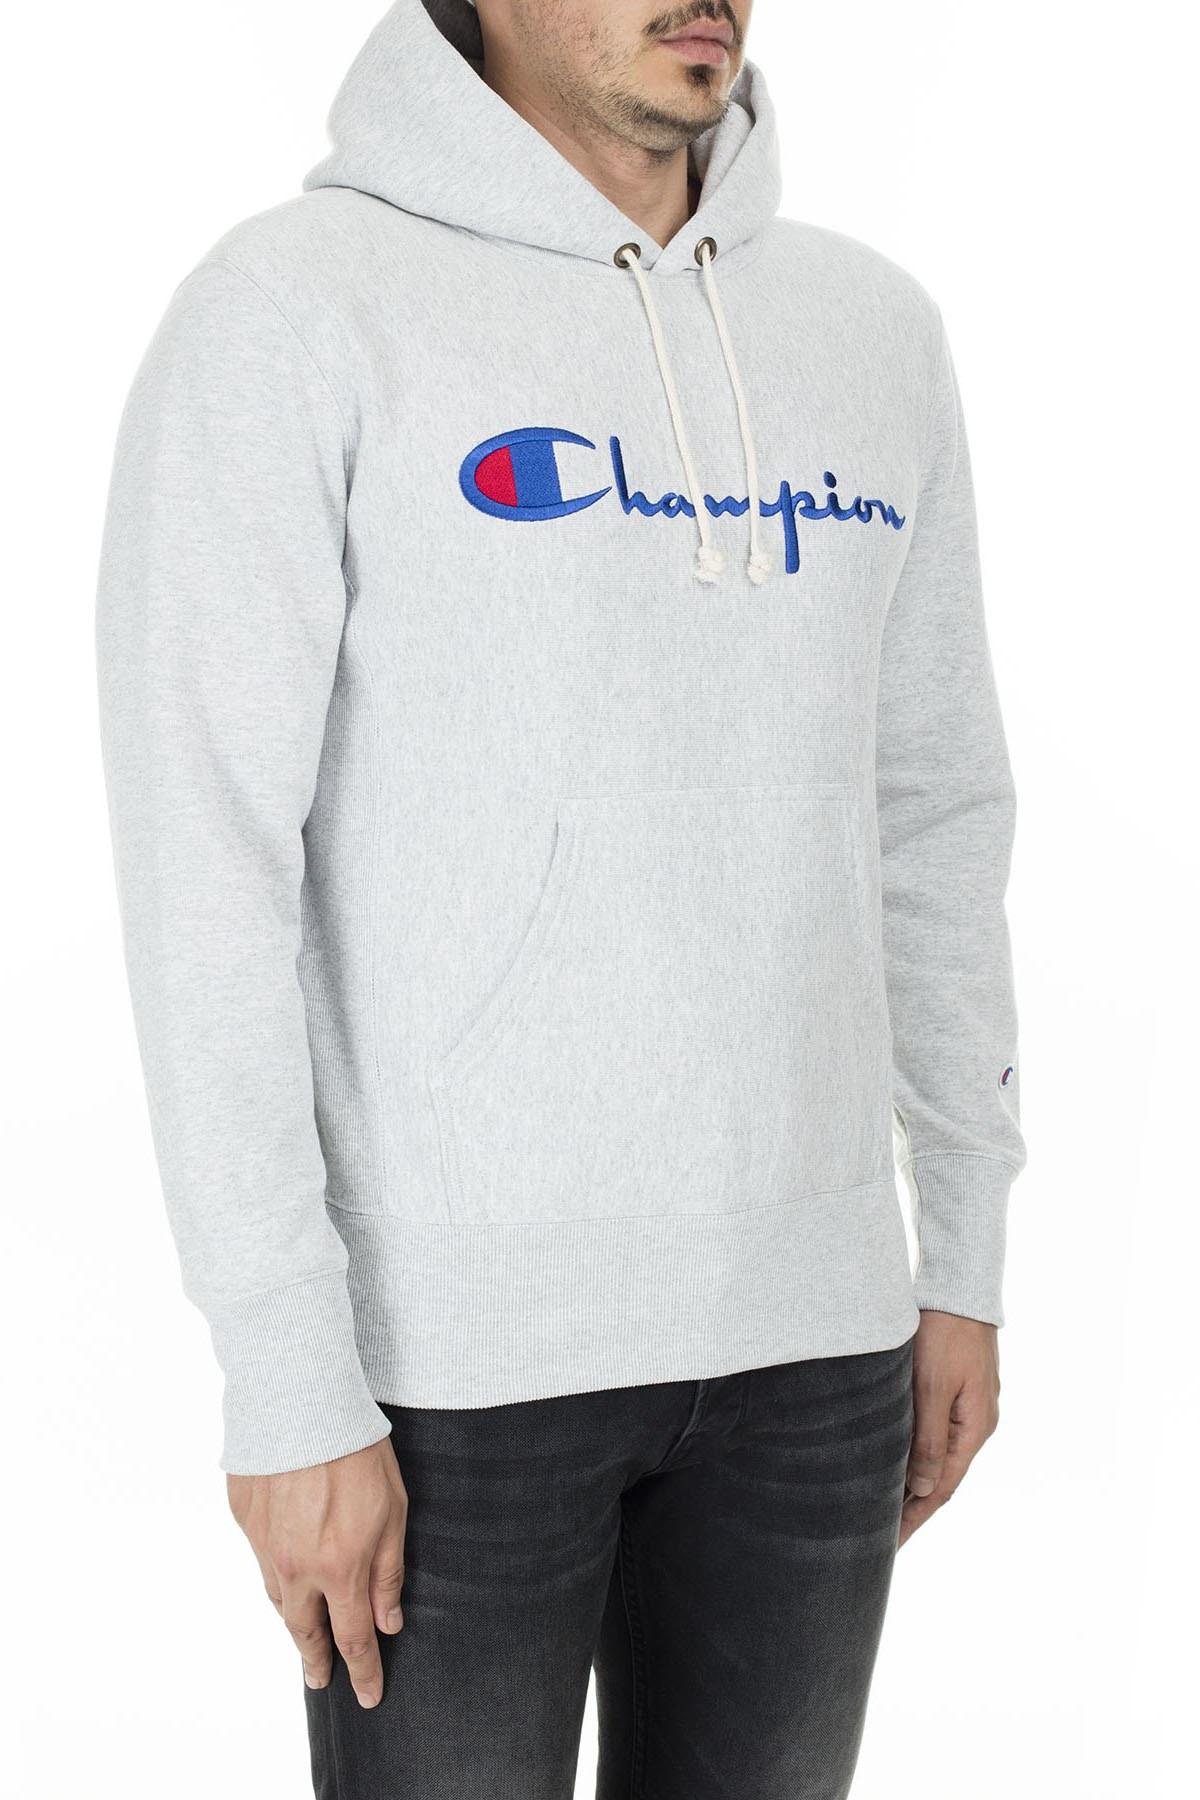 Champion Kanguru Cepli Kapüşonlu Erkek Sweat 212574 EM004 LOXGM AÇIK GRİ